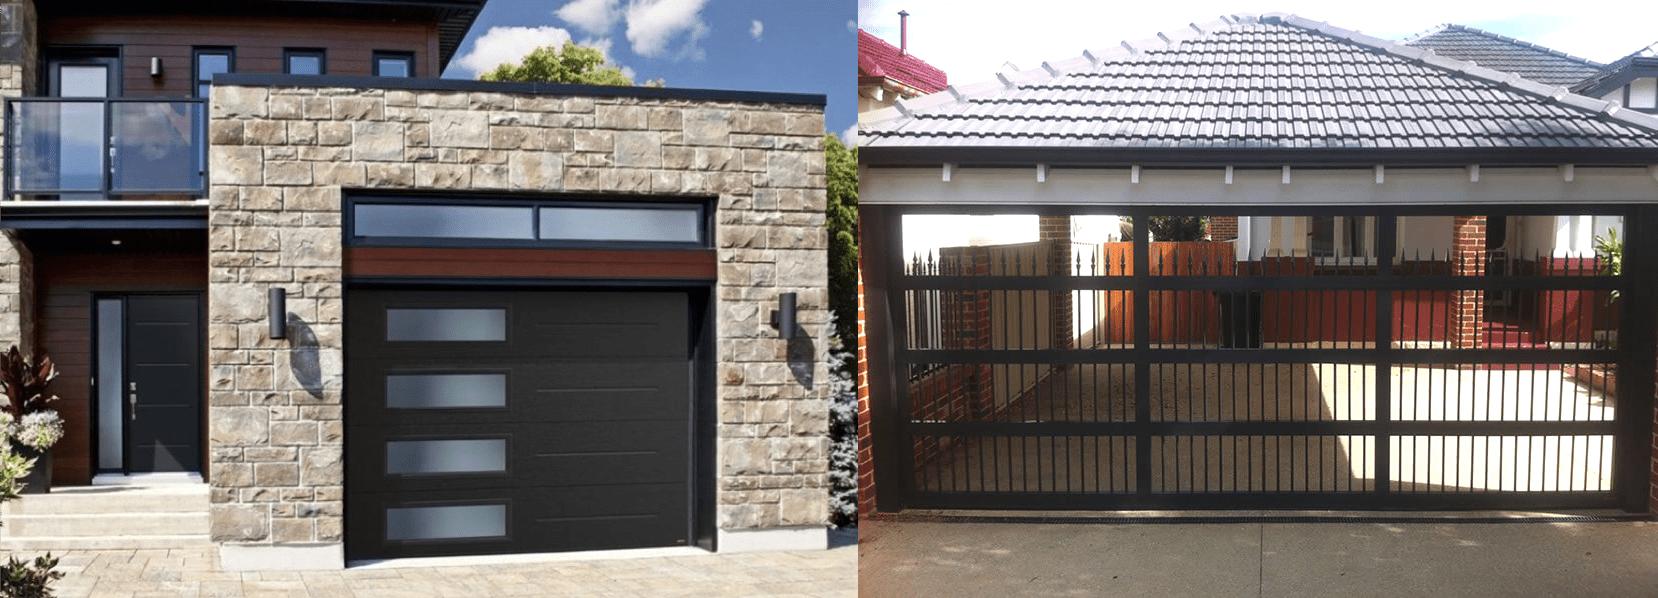 carport-versus-garage-image